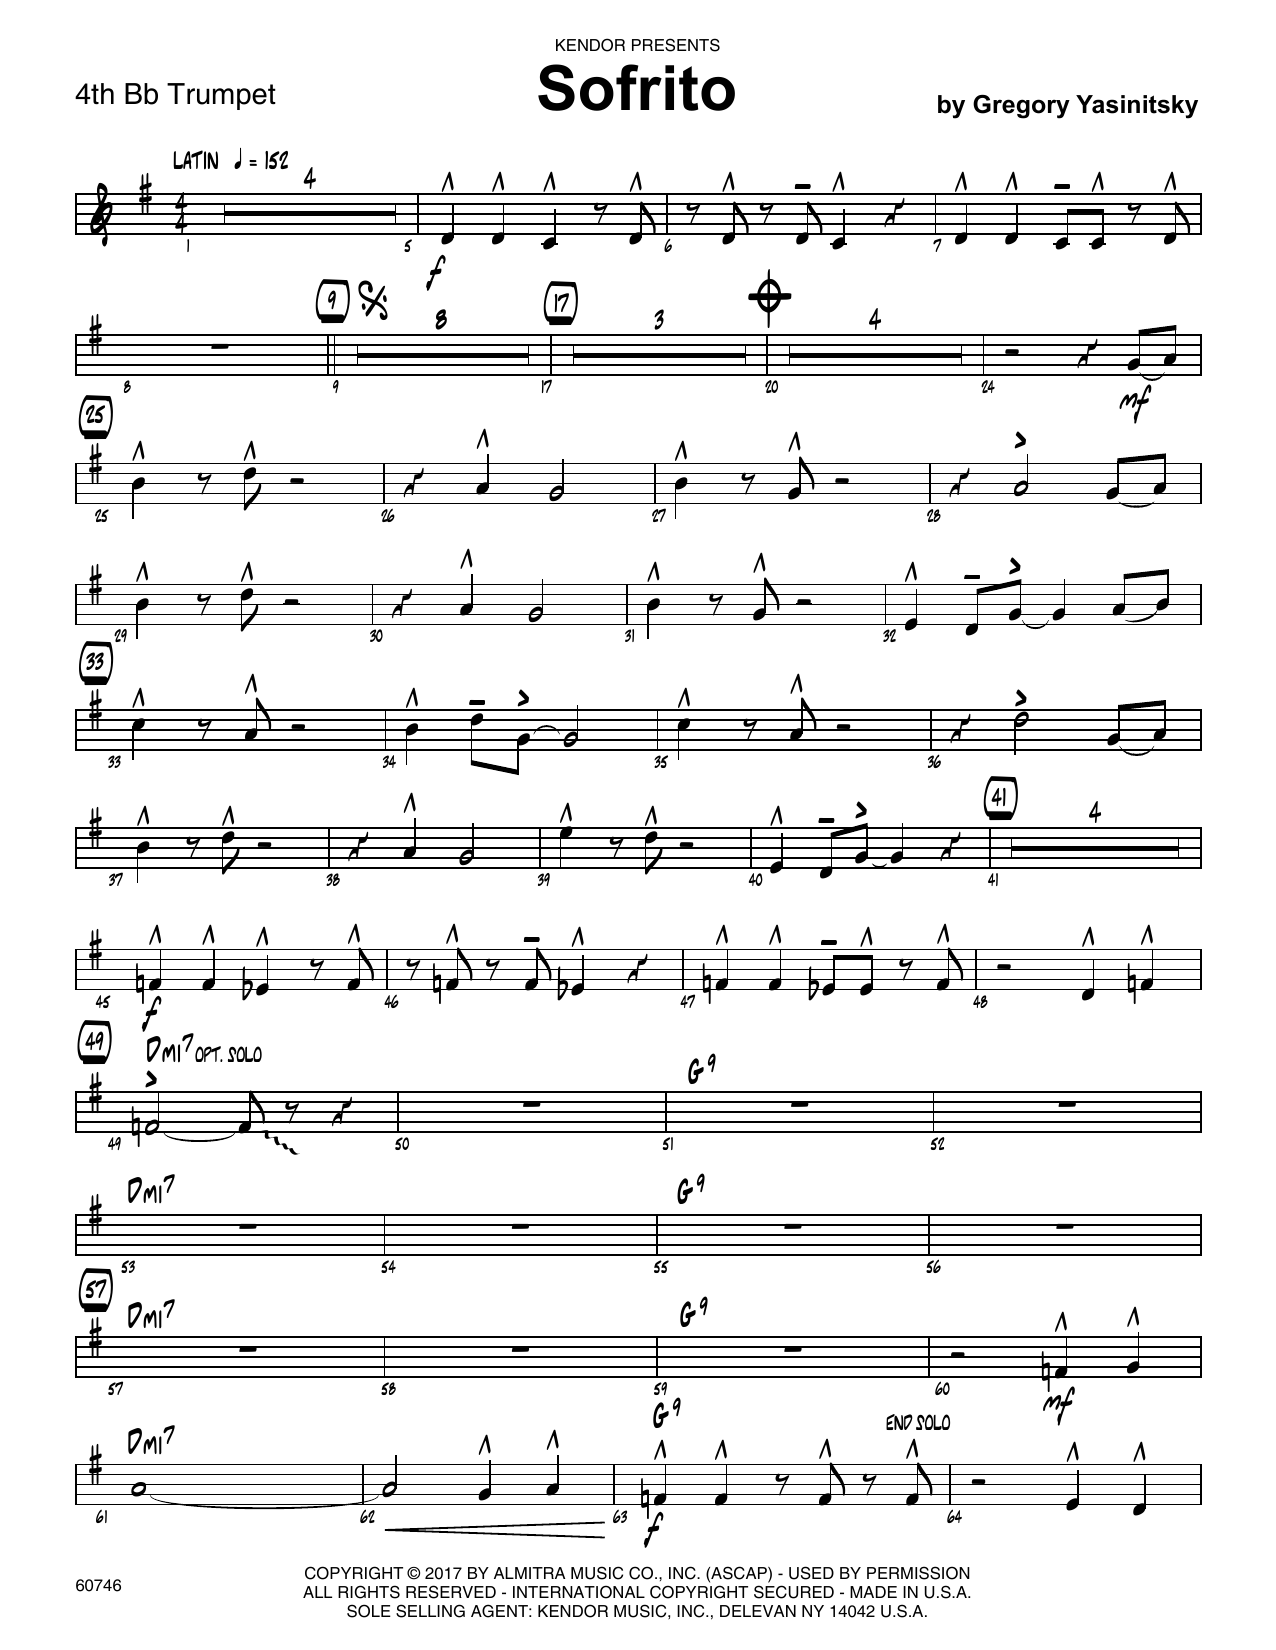 Sofrito - 4th Bb Trumpet Sheet Music